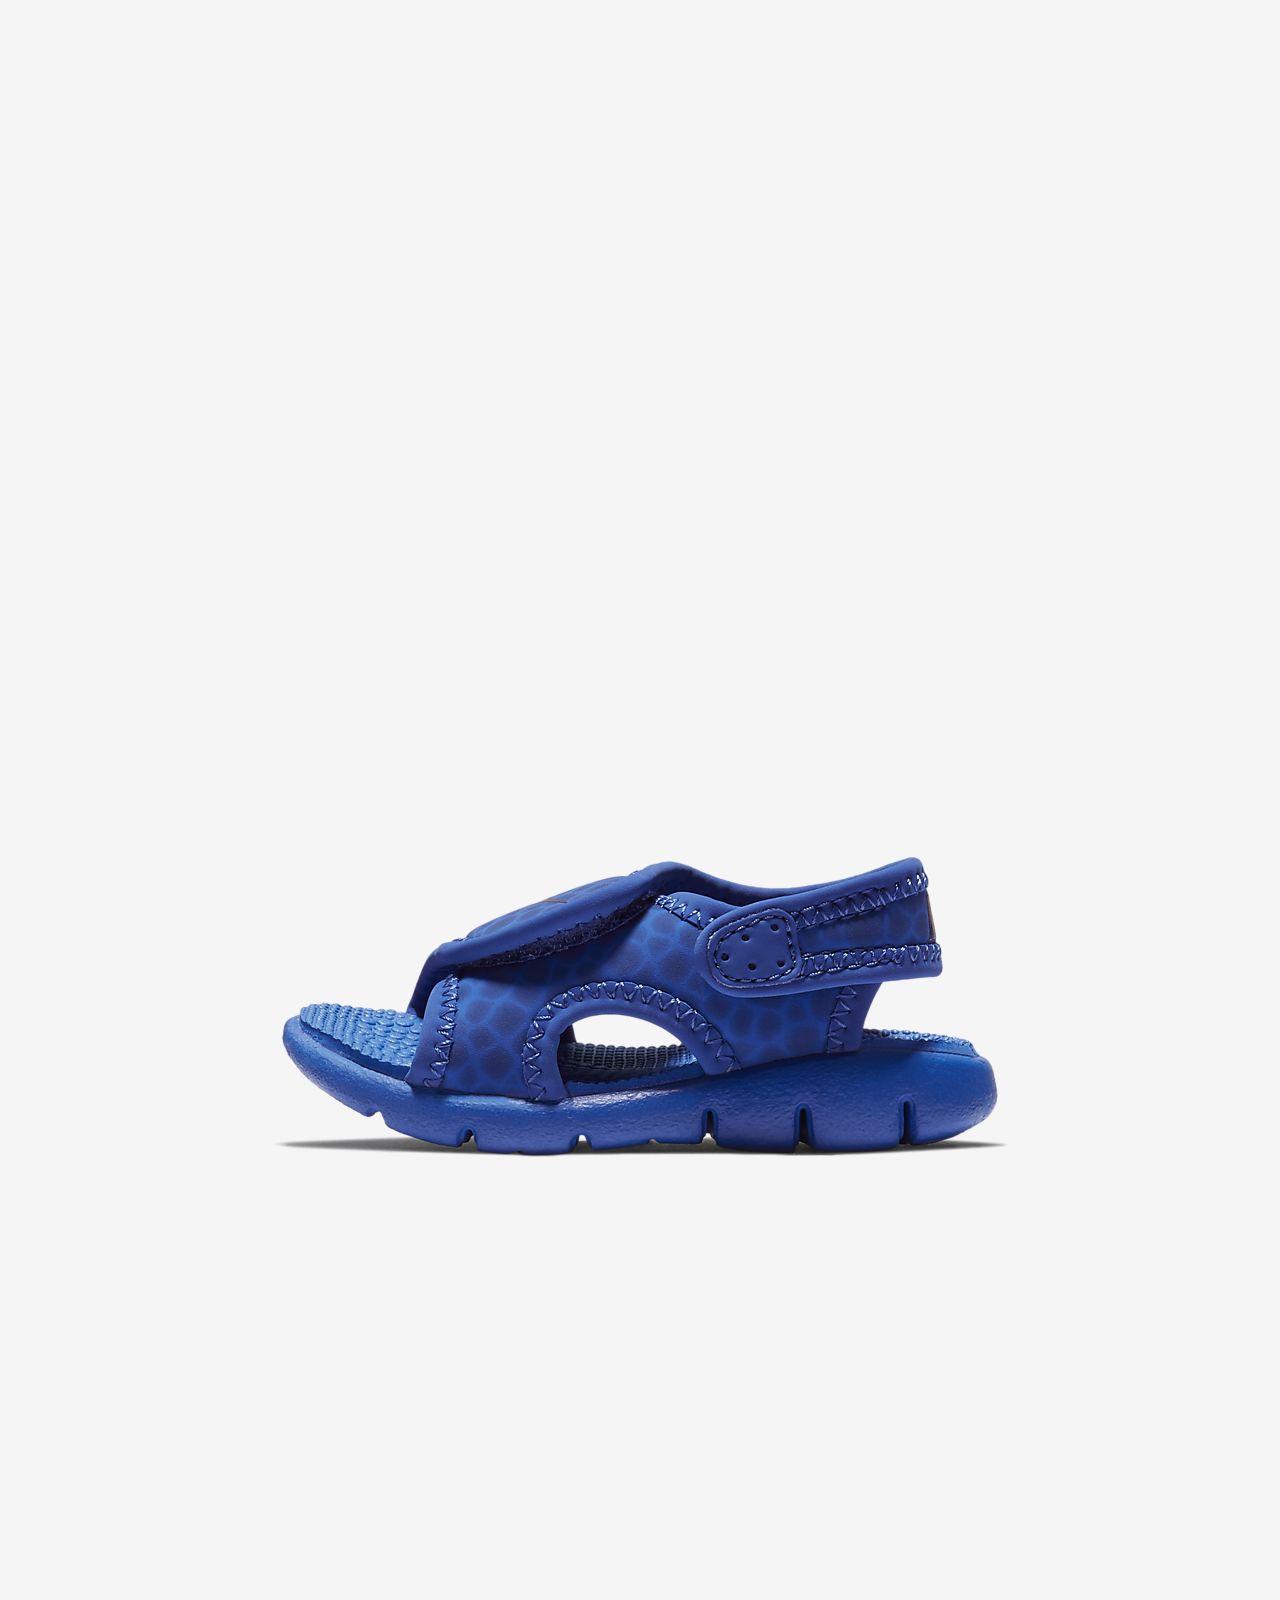 Nike Sunray Adjust 4 嬰幼兒涼鞋